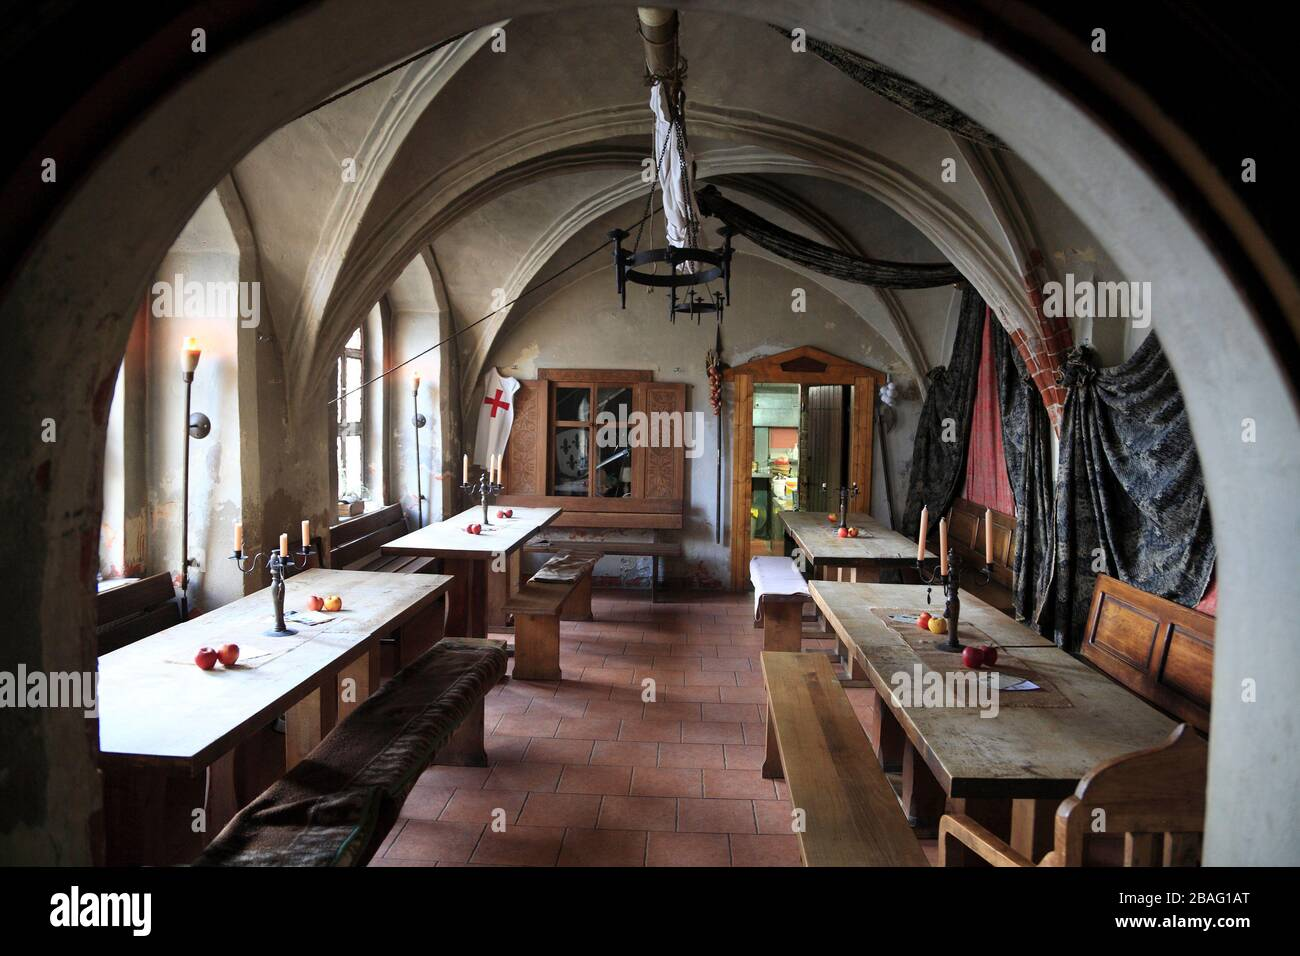 Restaurante Zechei Sankt Nikolai, Tangermuende, Tangemünde, Altmark, Sajonia-Anhalt, Alemania, Europa Foto de stock